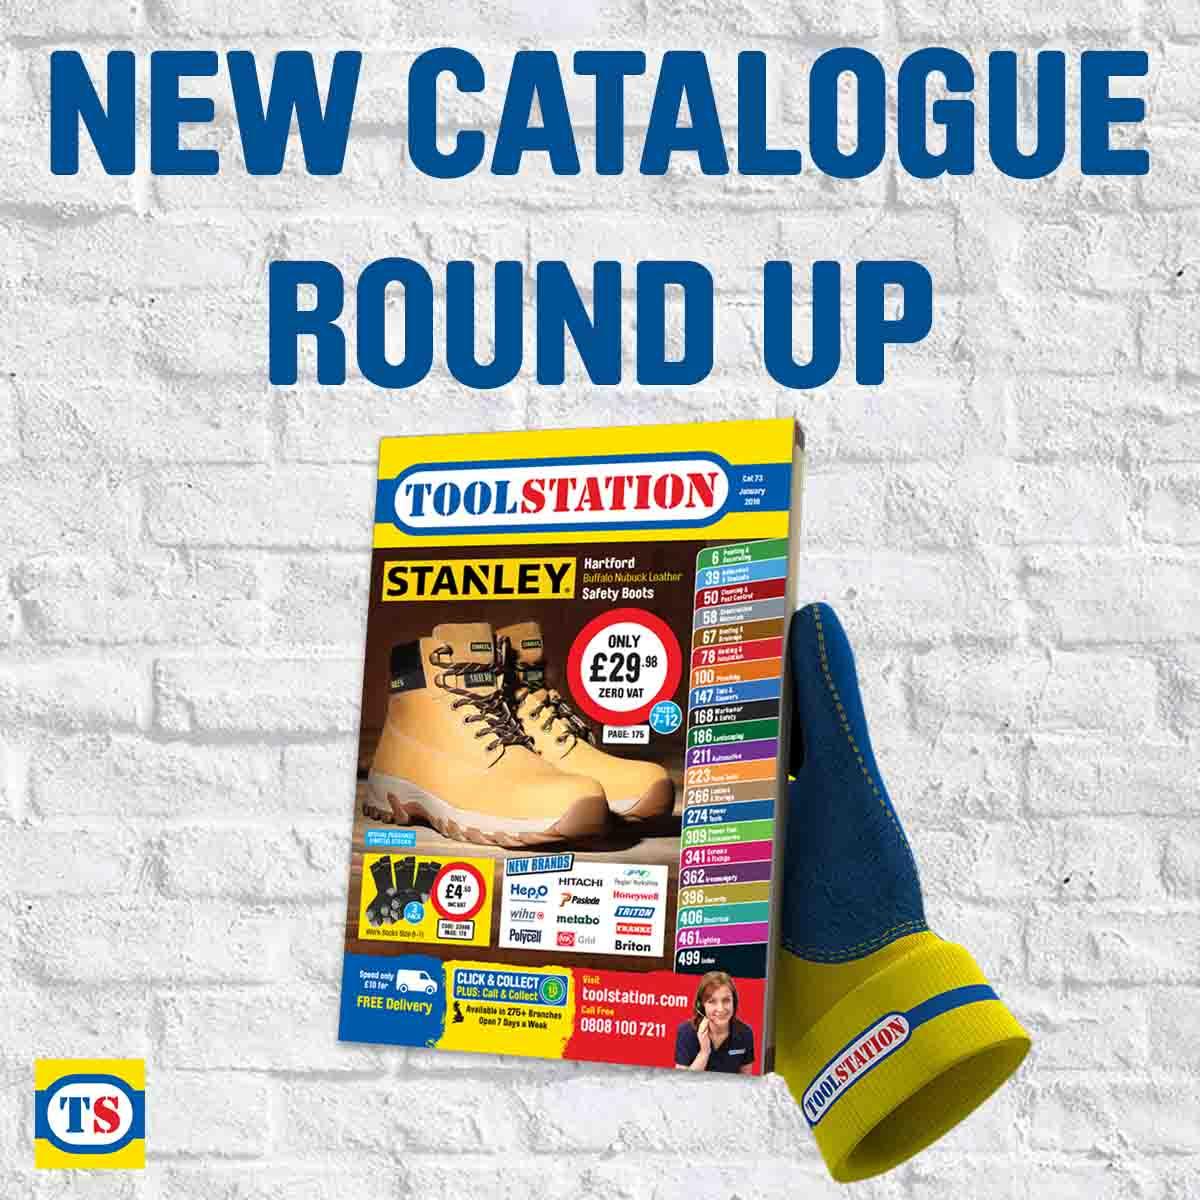 New Catalogue Round Up – Catalogue 73